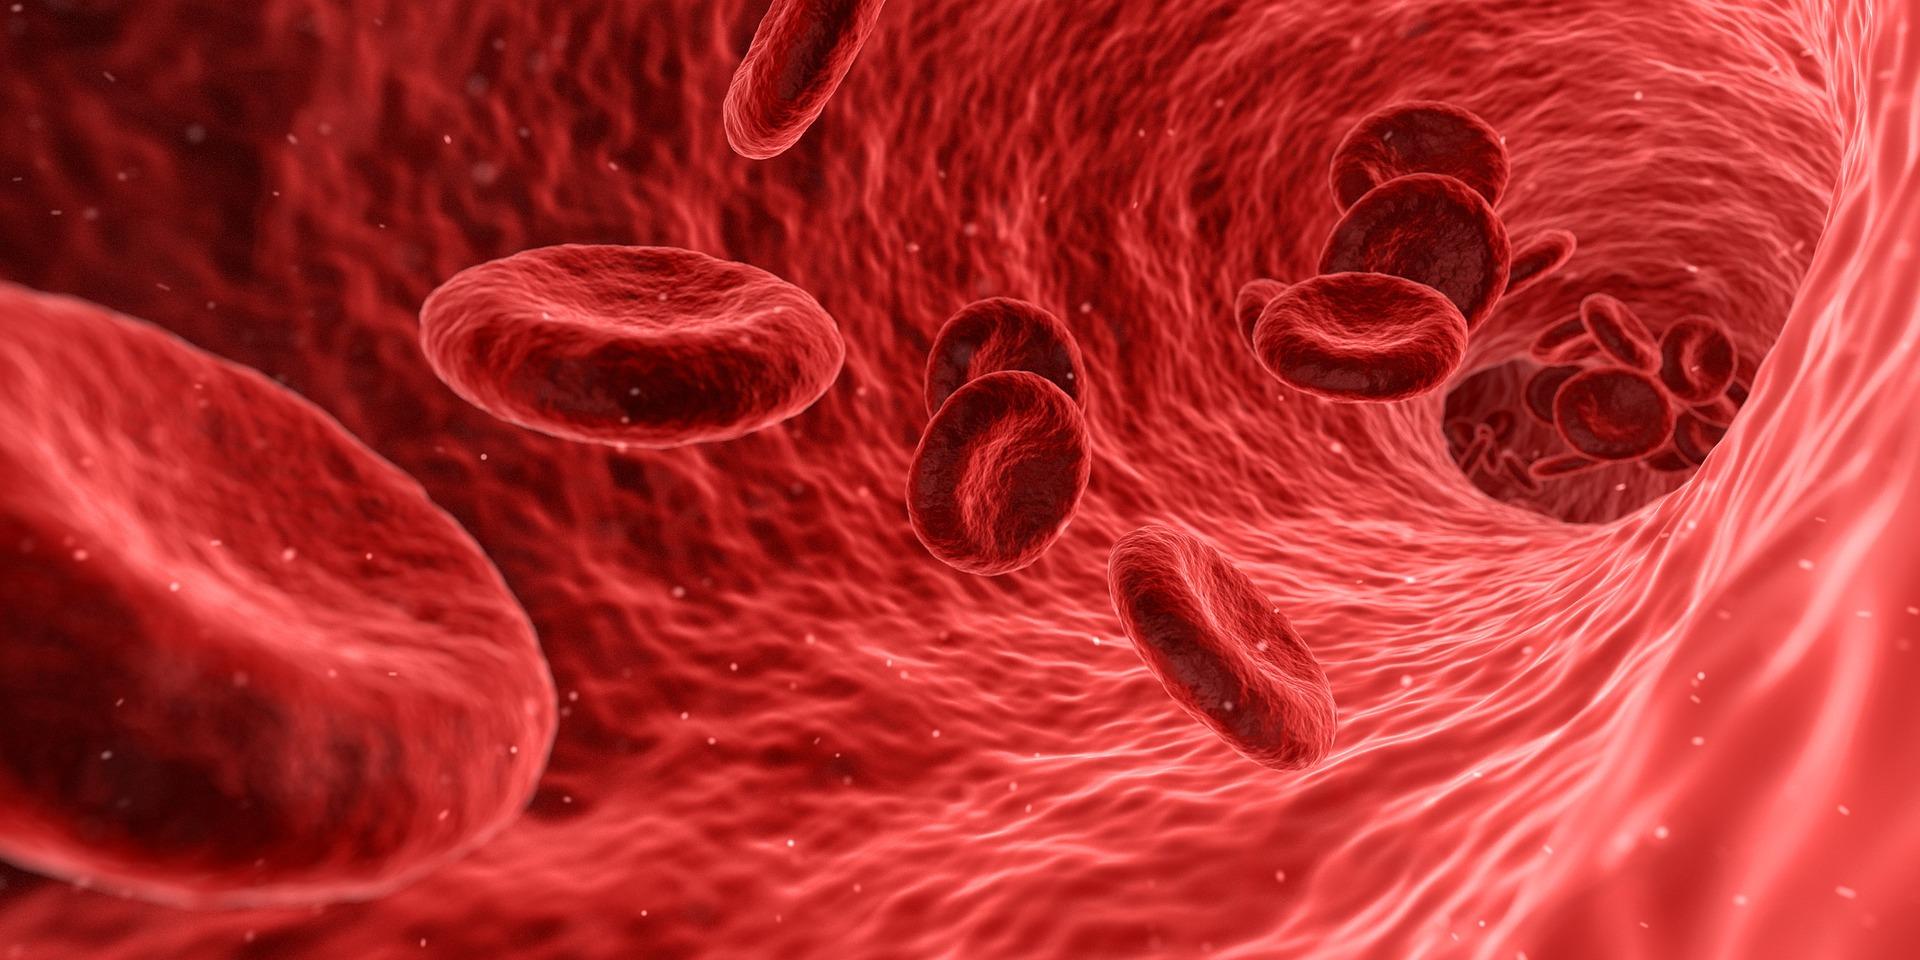 Bedeutung der Nieren im Säure-Basen-Haushalt